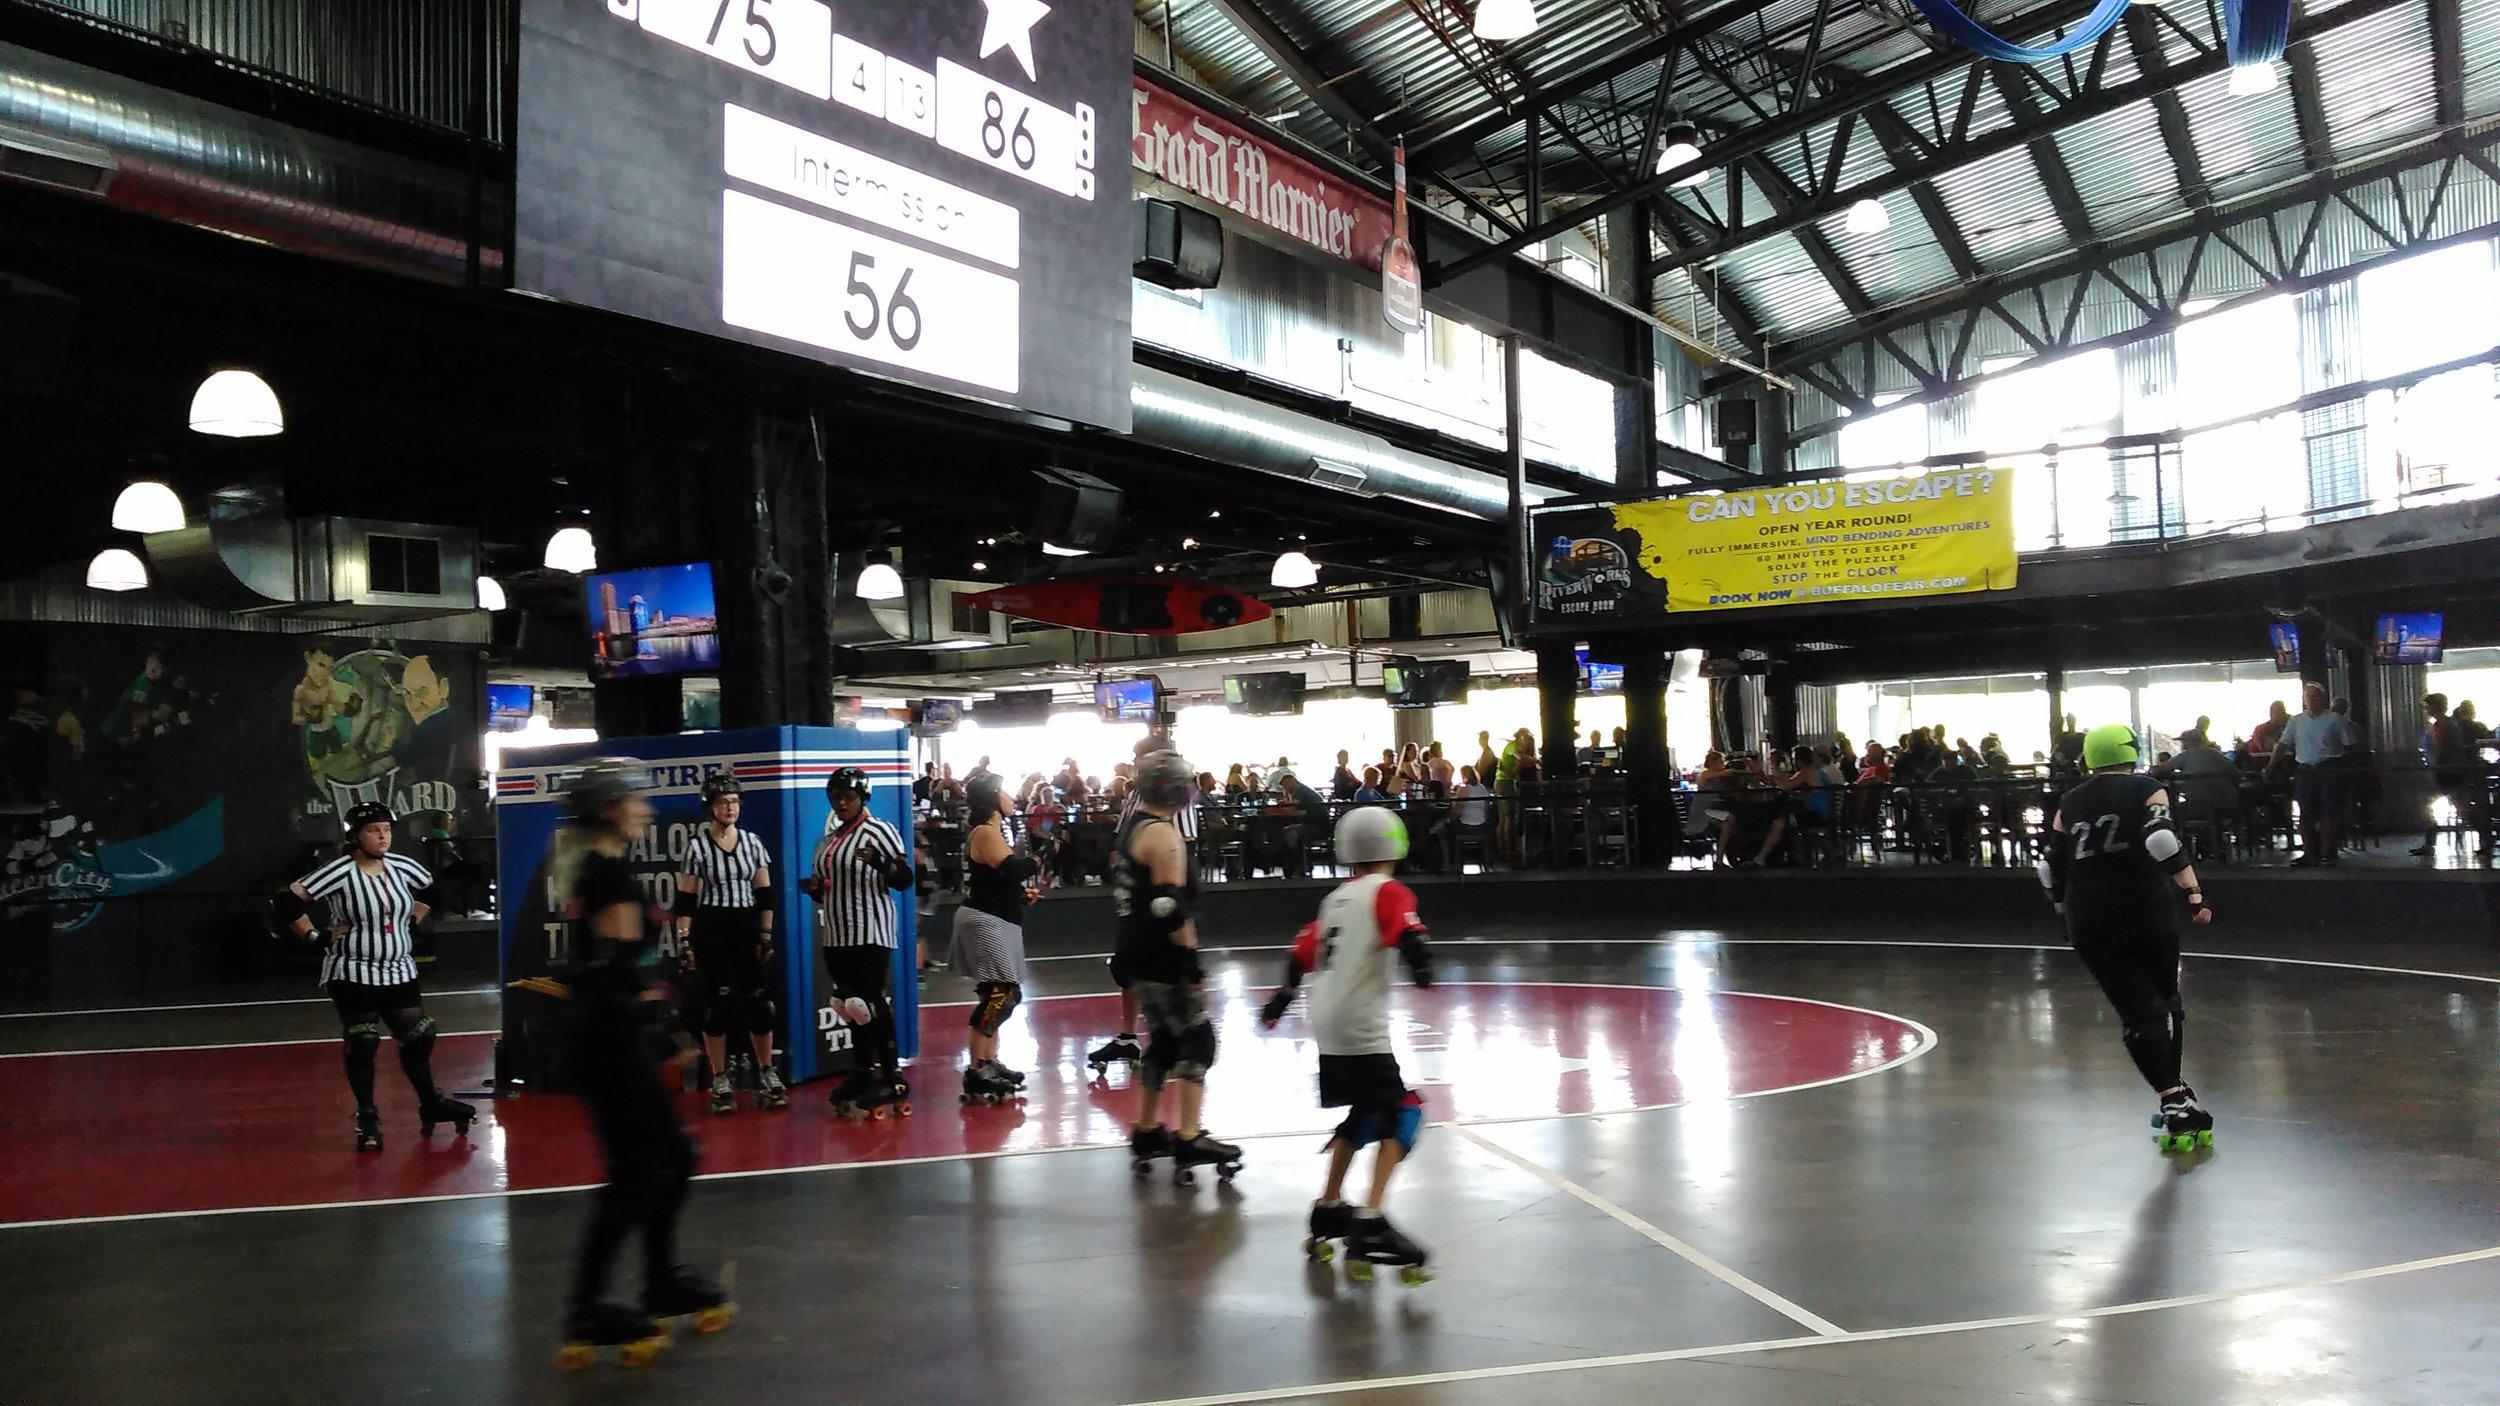 Family Travel: Buffalo Riverside Roller Derby